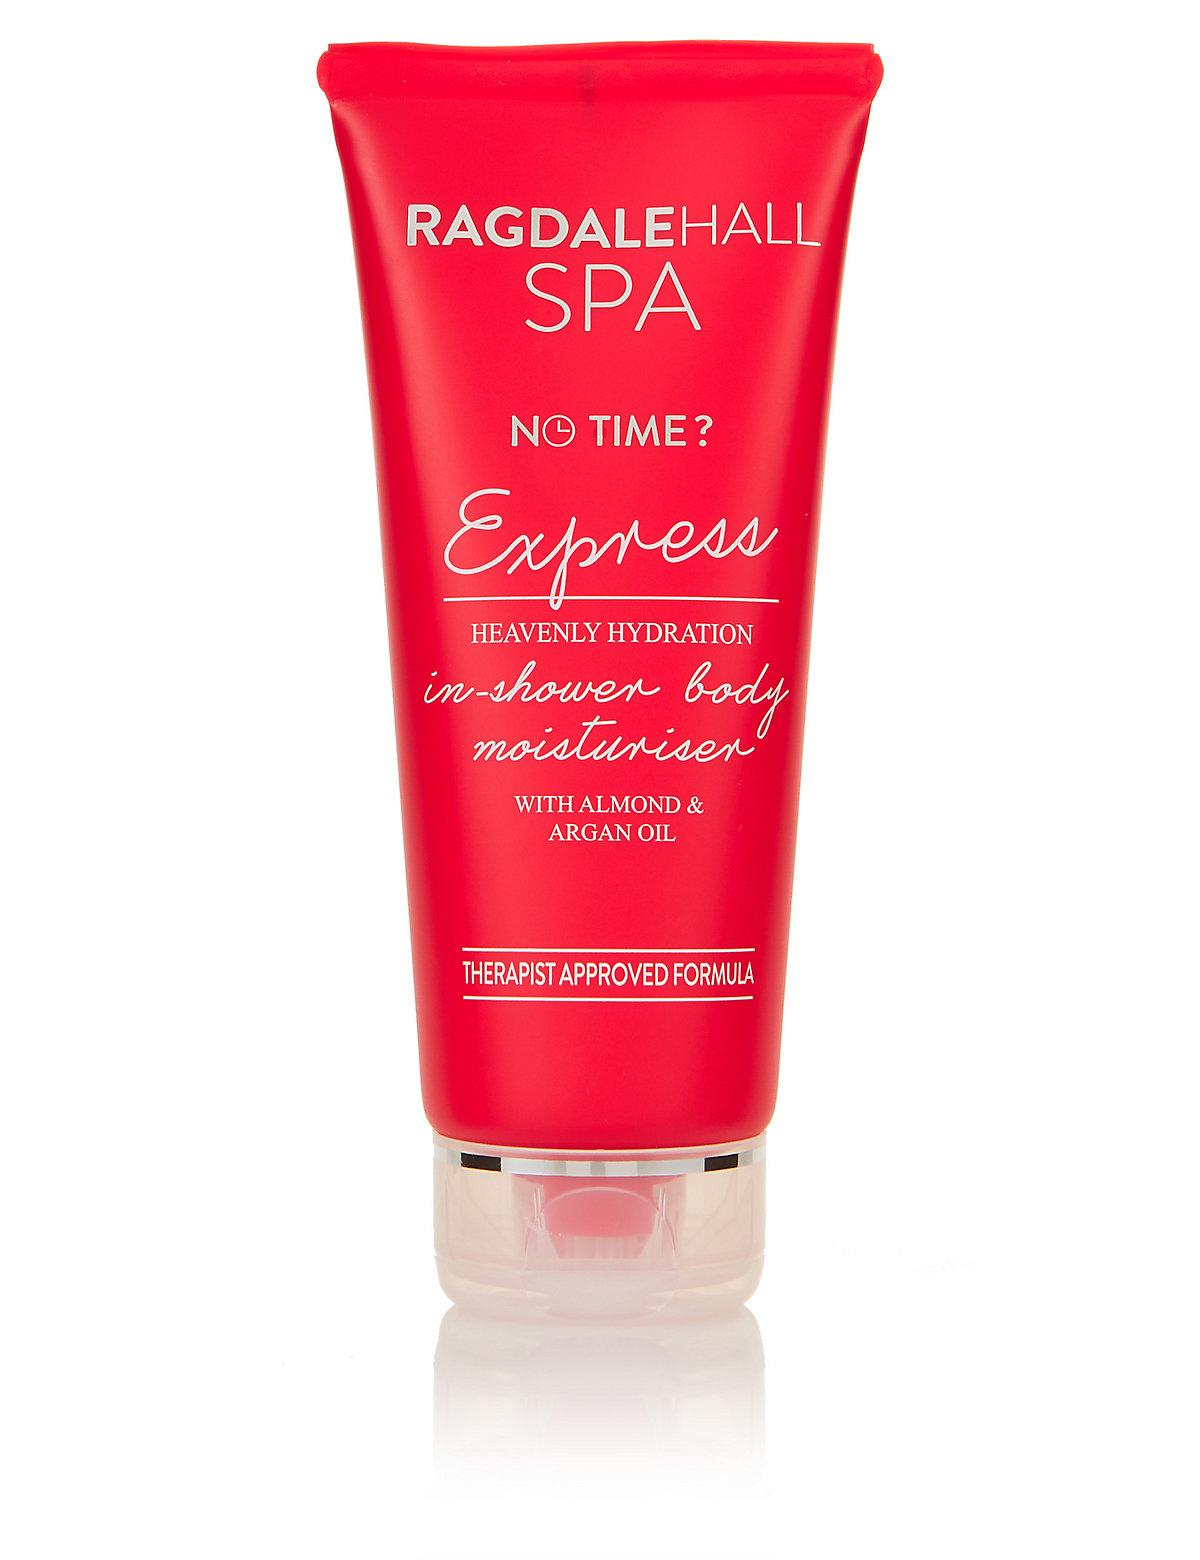 Ragdale Hall Express In-Shower Body Moisturiser 200ml